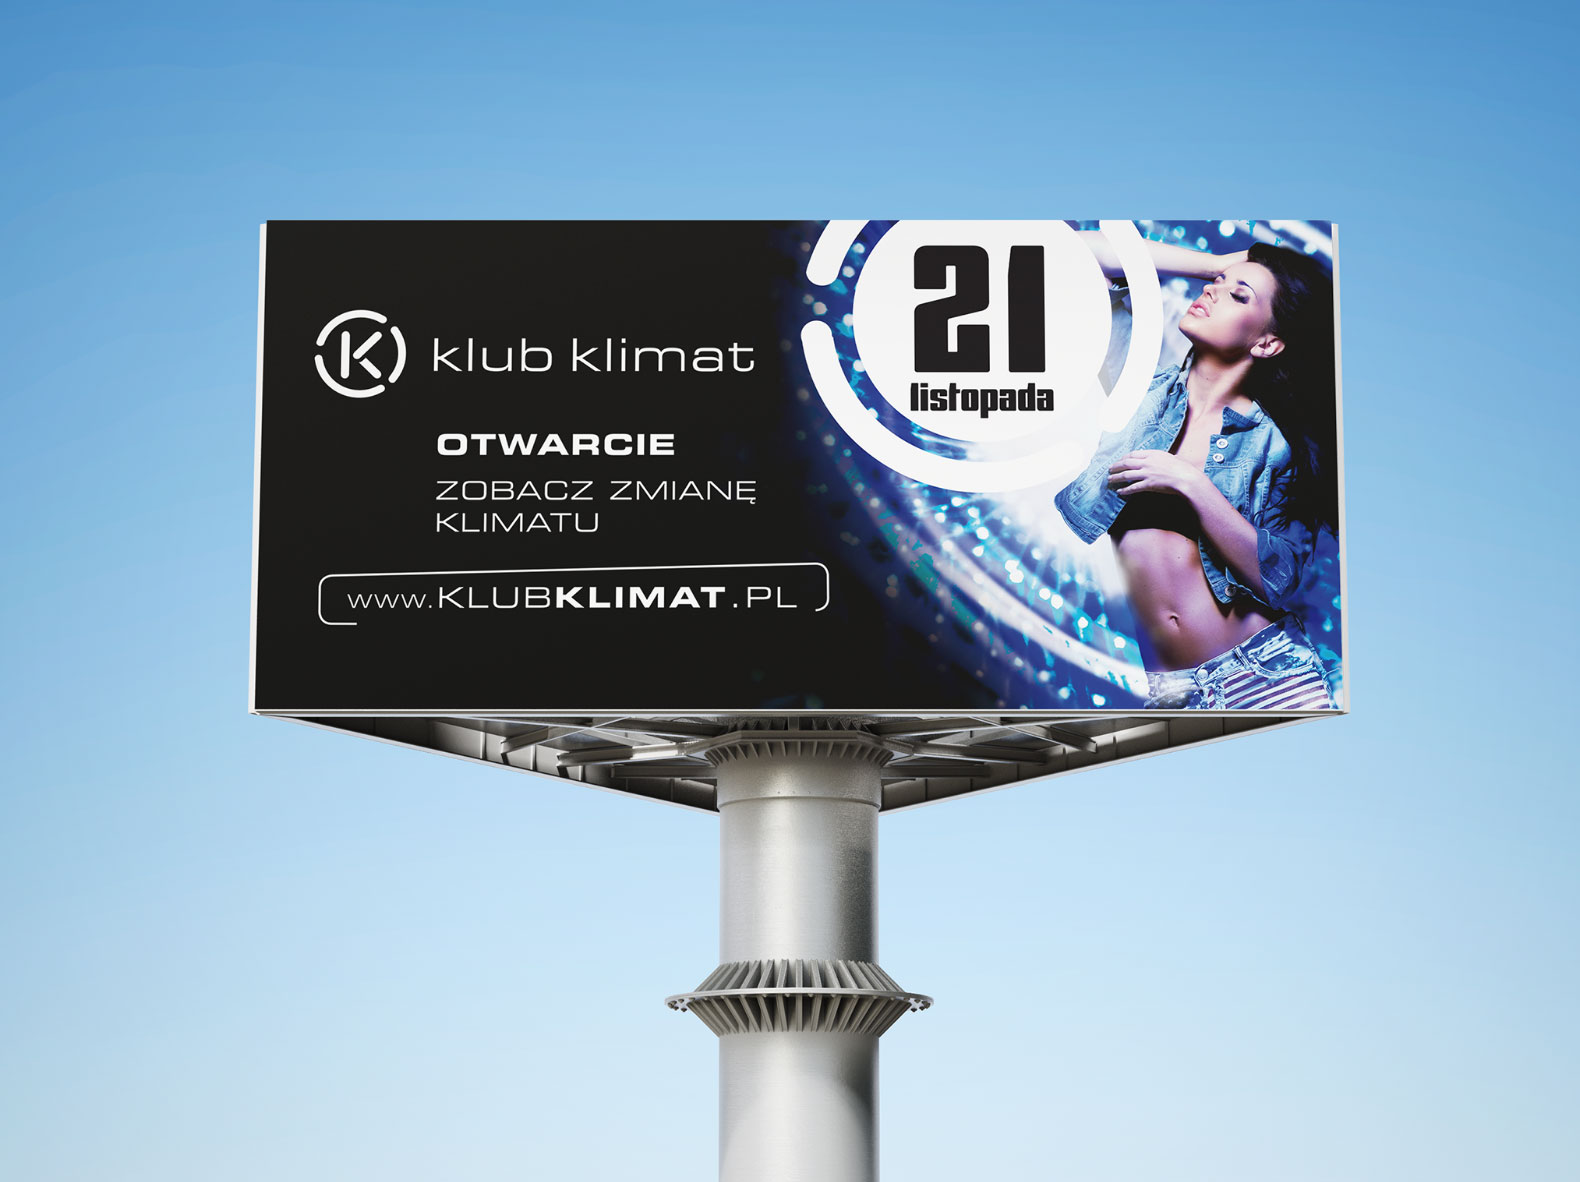 billboard – logo monogram Klub Klimat